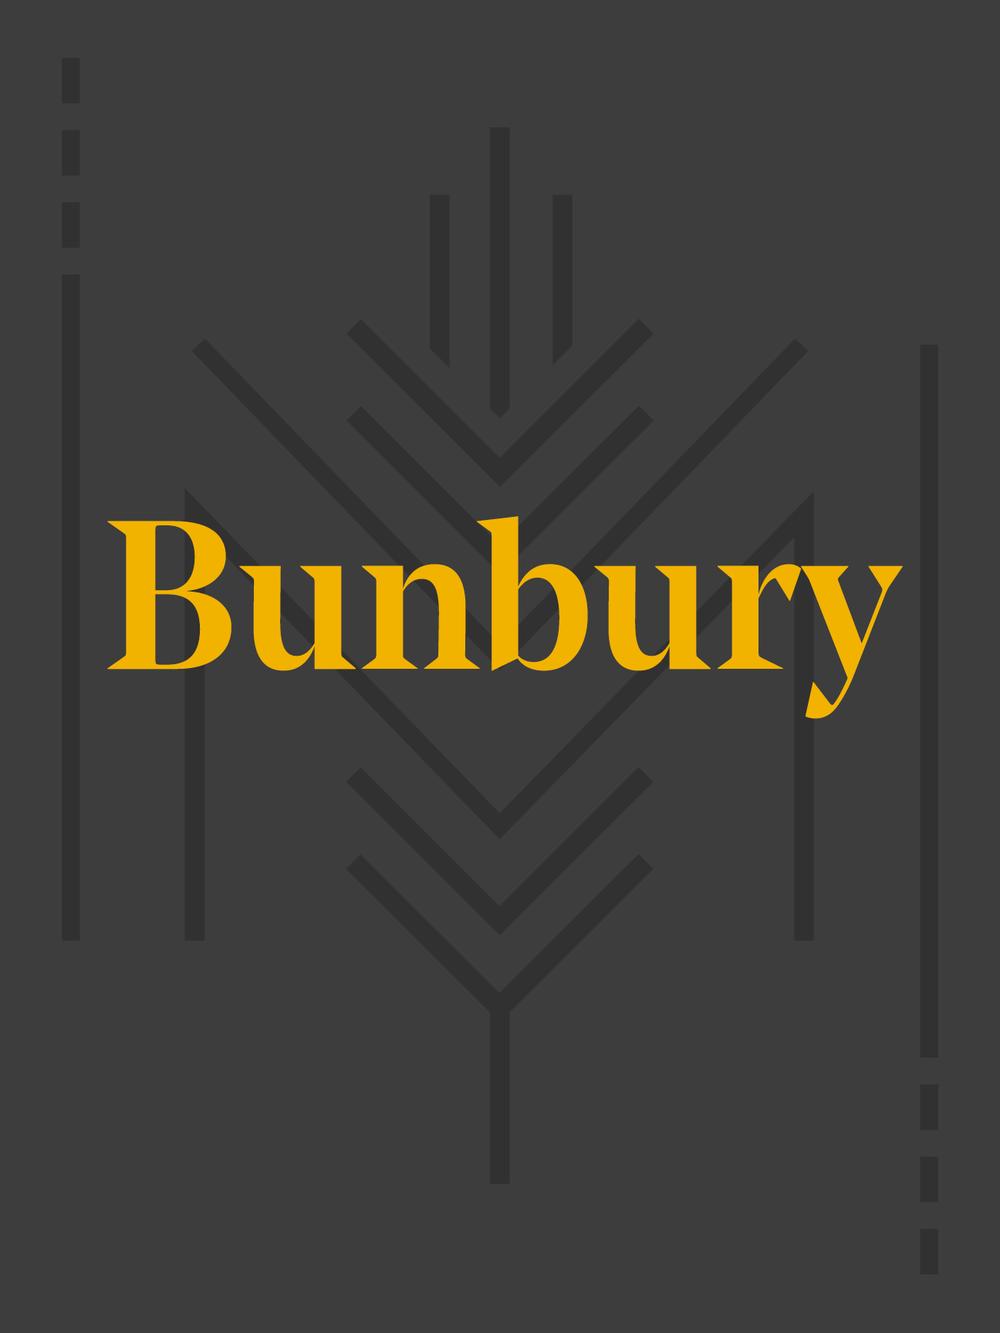 Bunbury.png